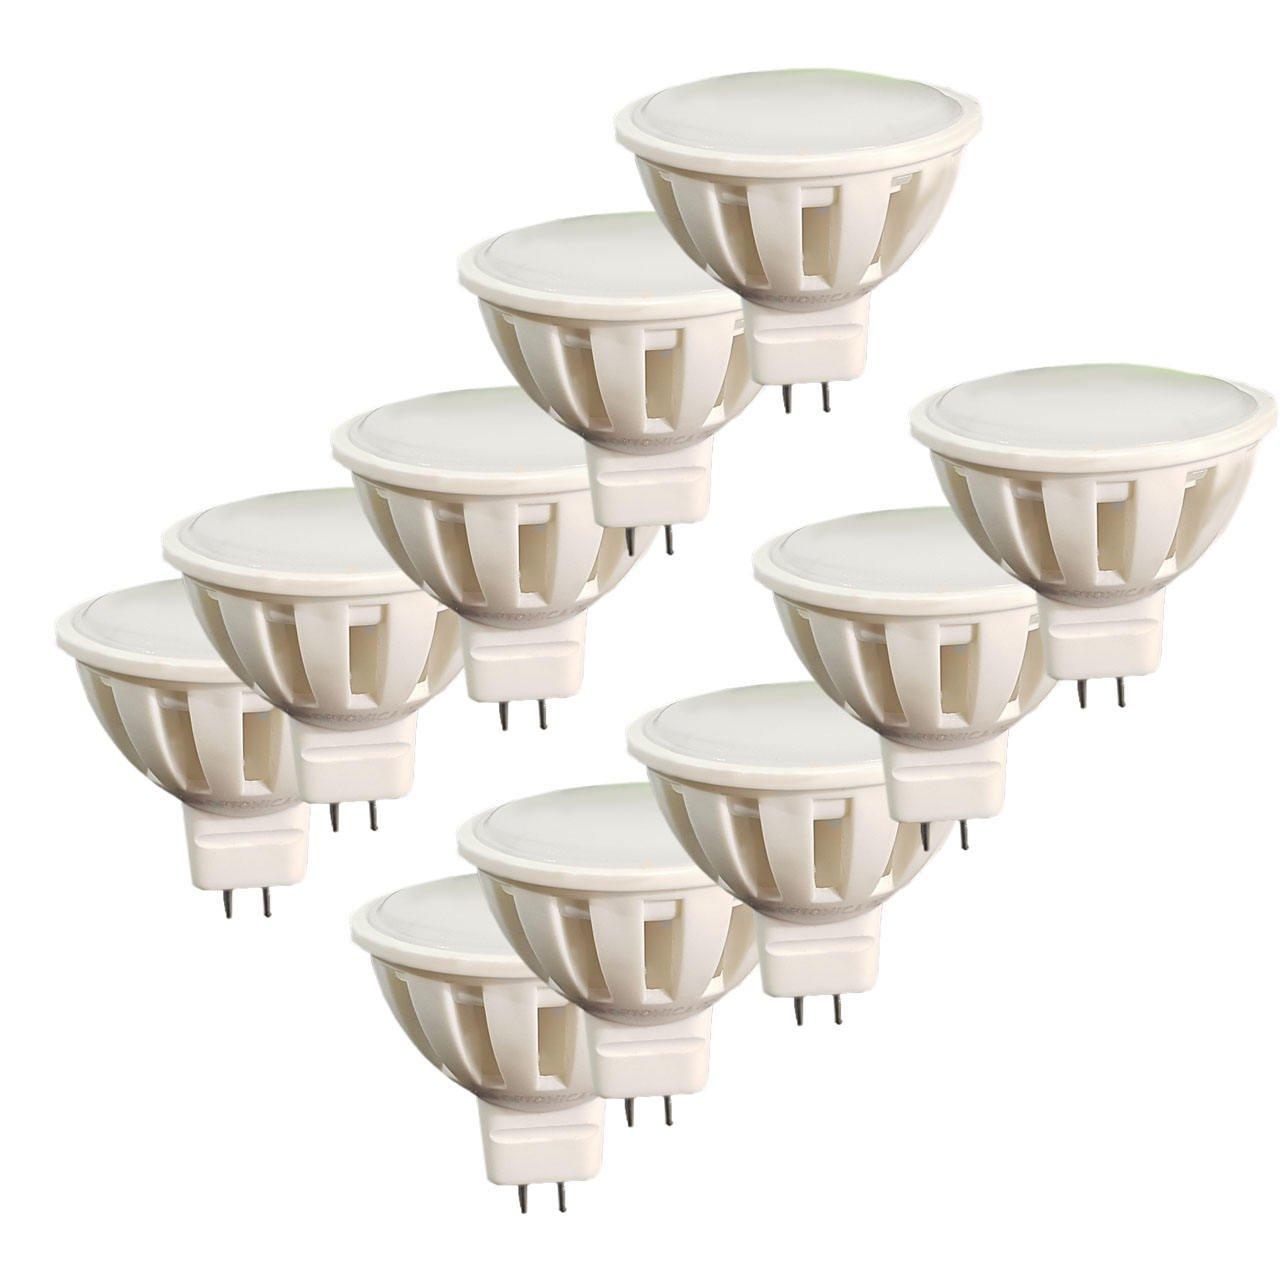 لامپ ال ای دی هالوژنی بسته 10 تایی